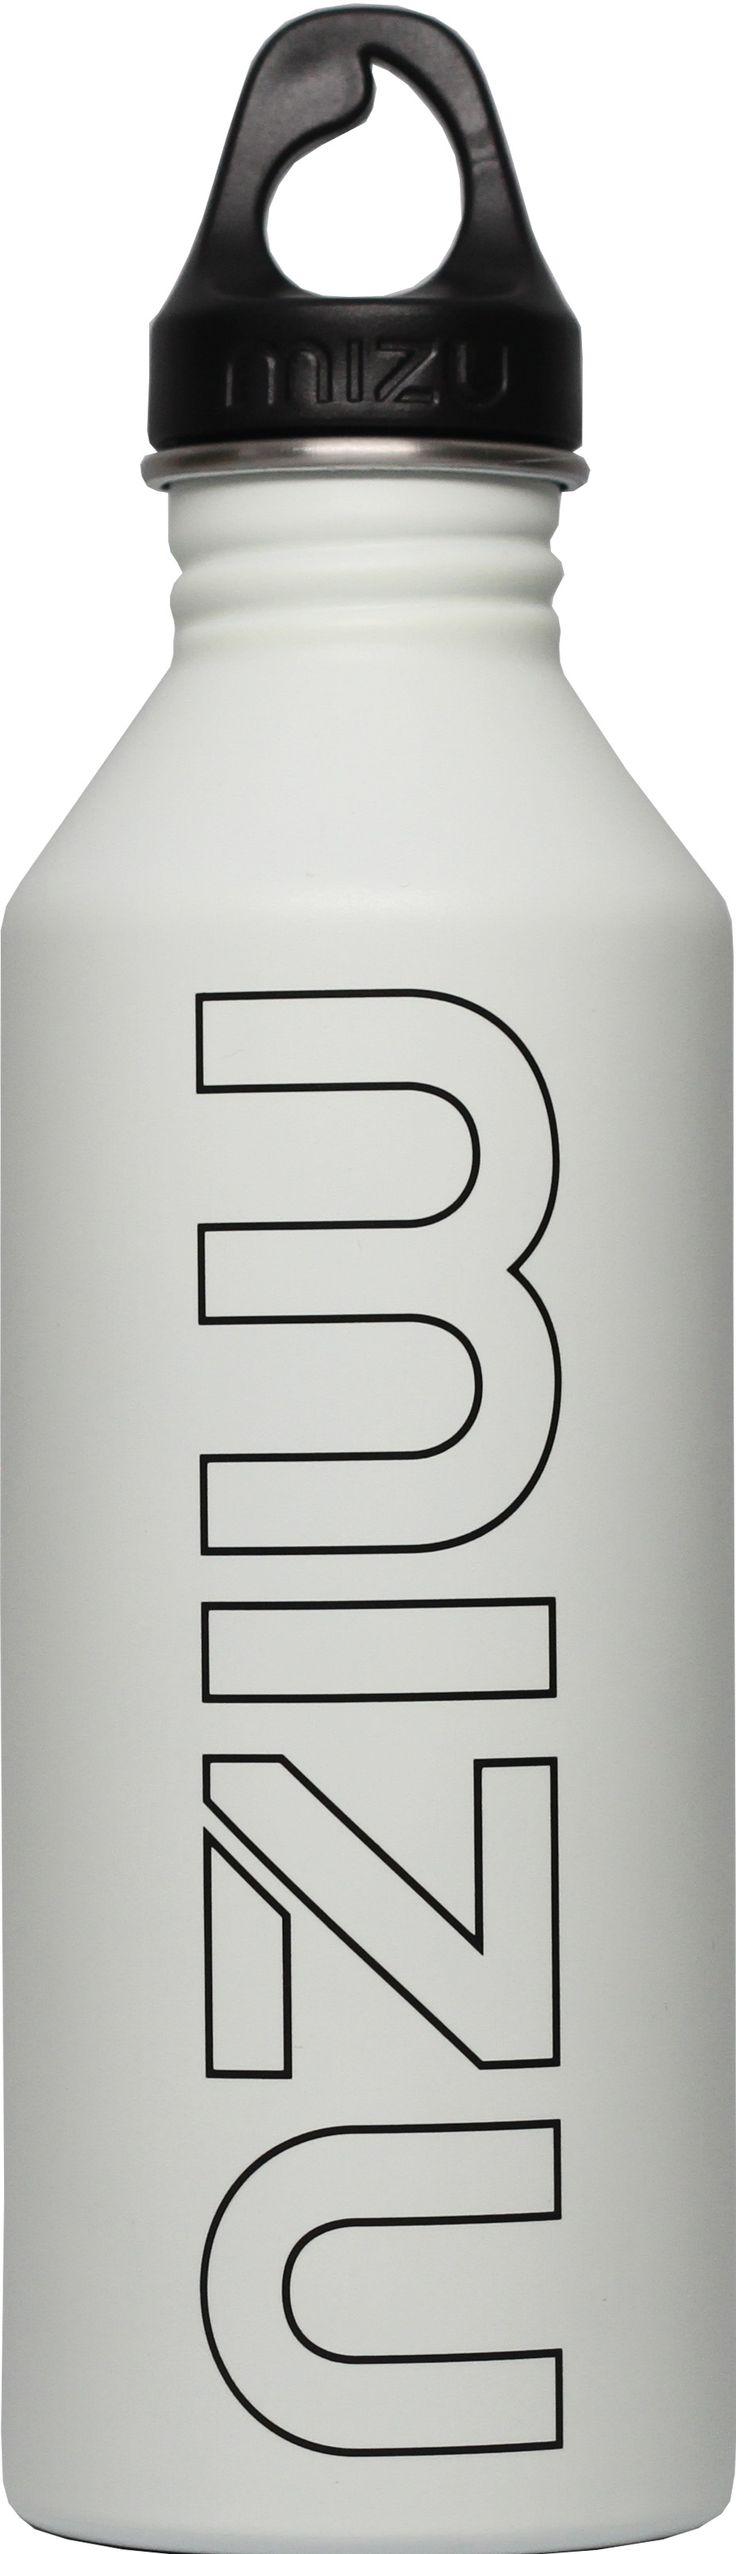 White Mizu Bottle